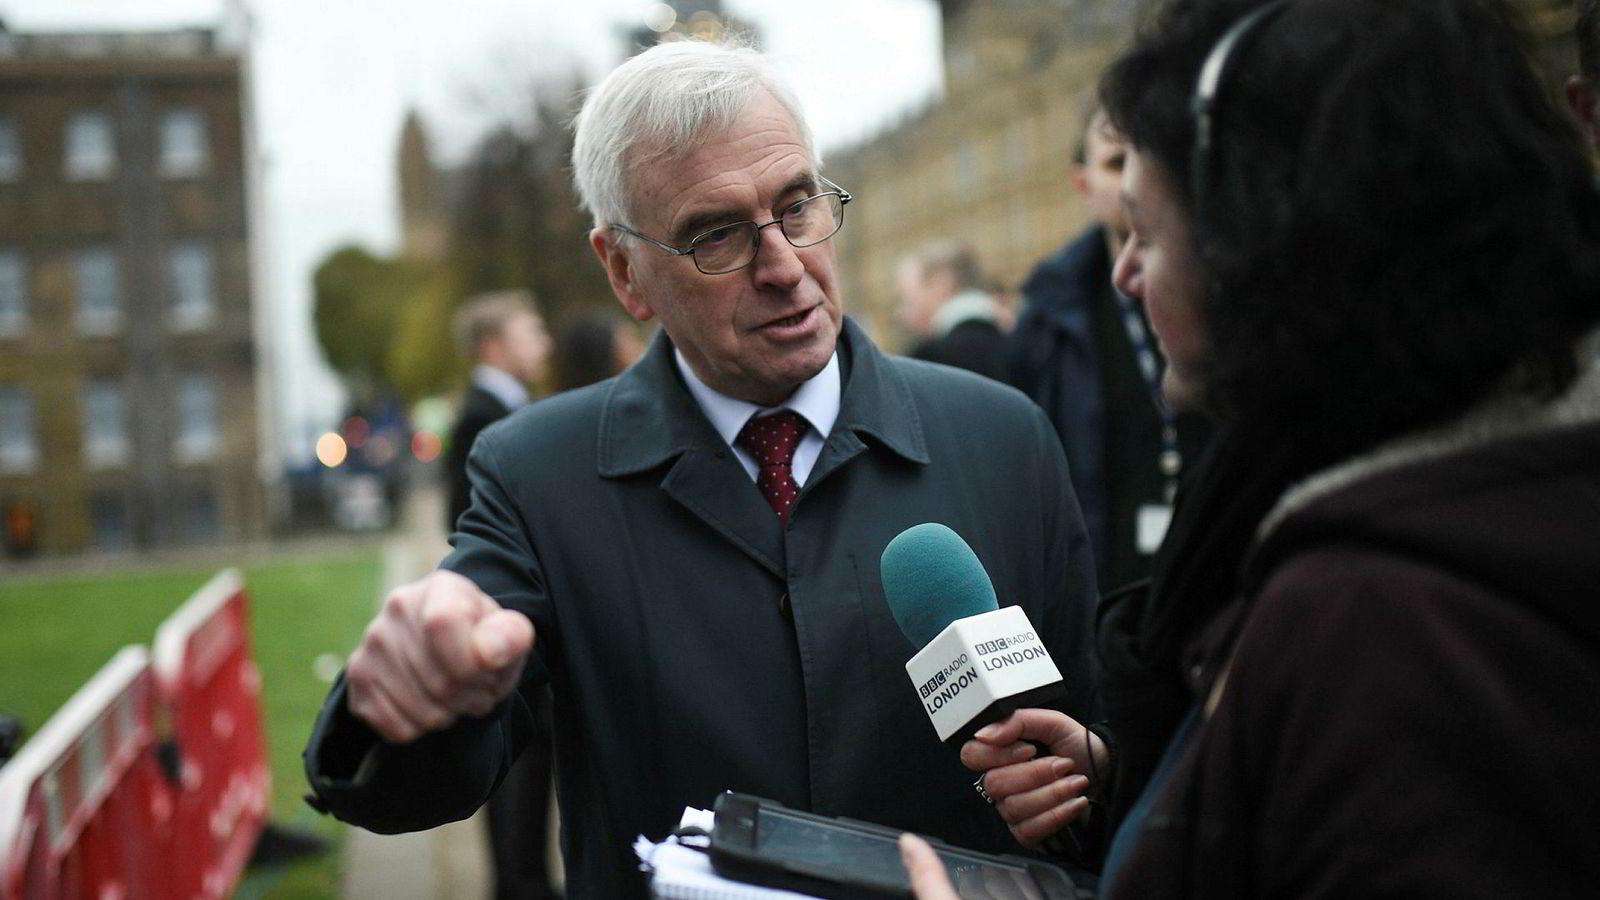 Labours finanstalsmann John McDonnell sier til BBC at det er «svært sannsynlig» at både Labour og parlamentsmedlemmer fra andre partier vil støtte forslaget, som kommer fra Labours Yvette Cooper.